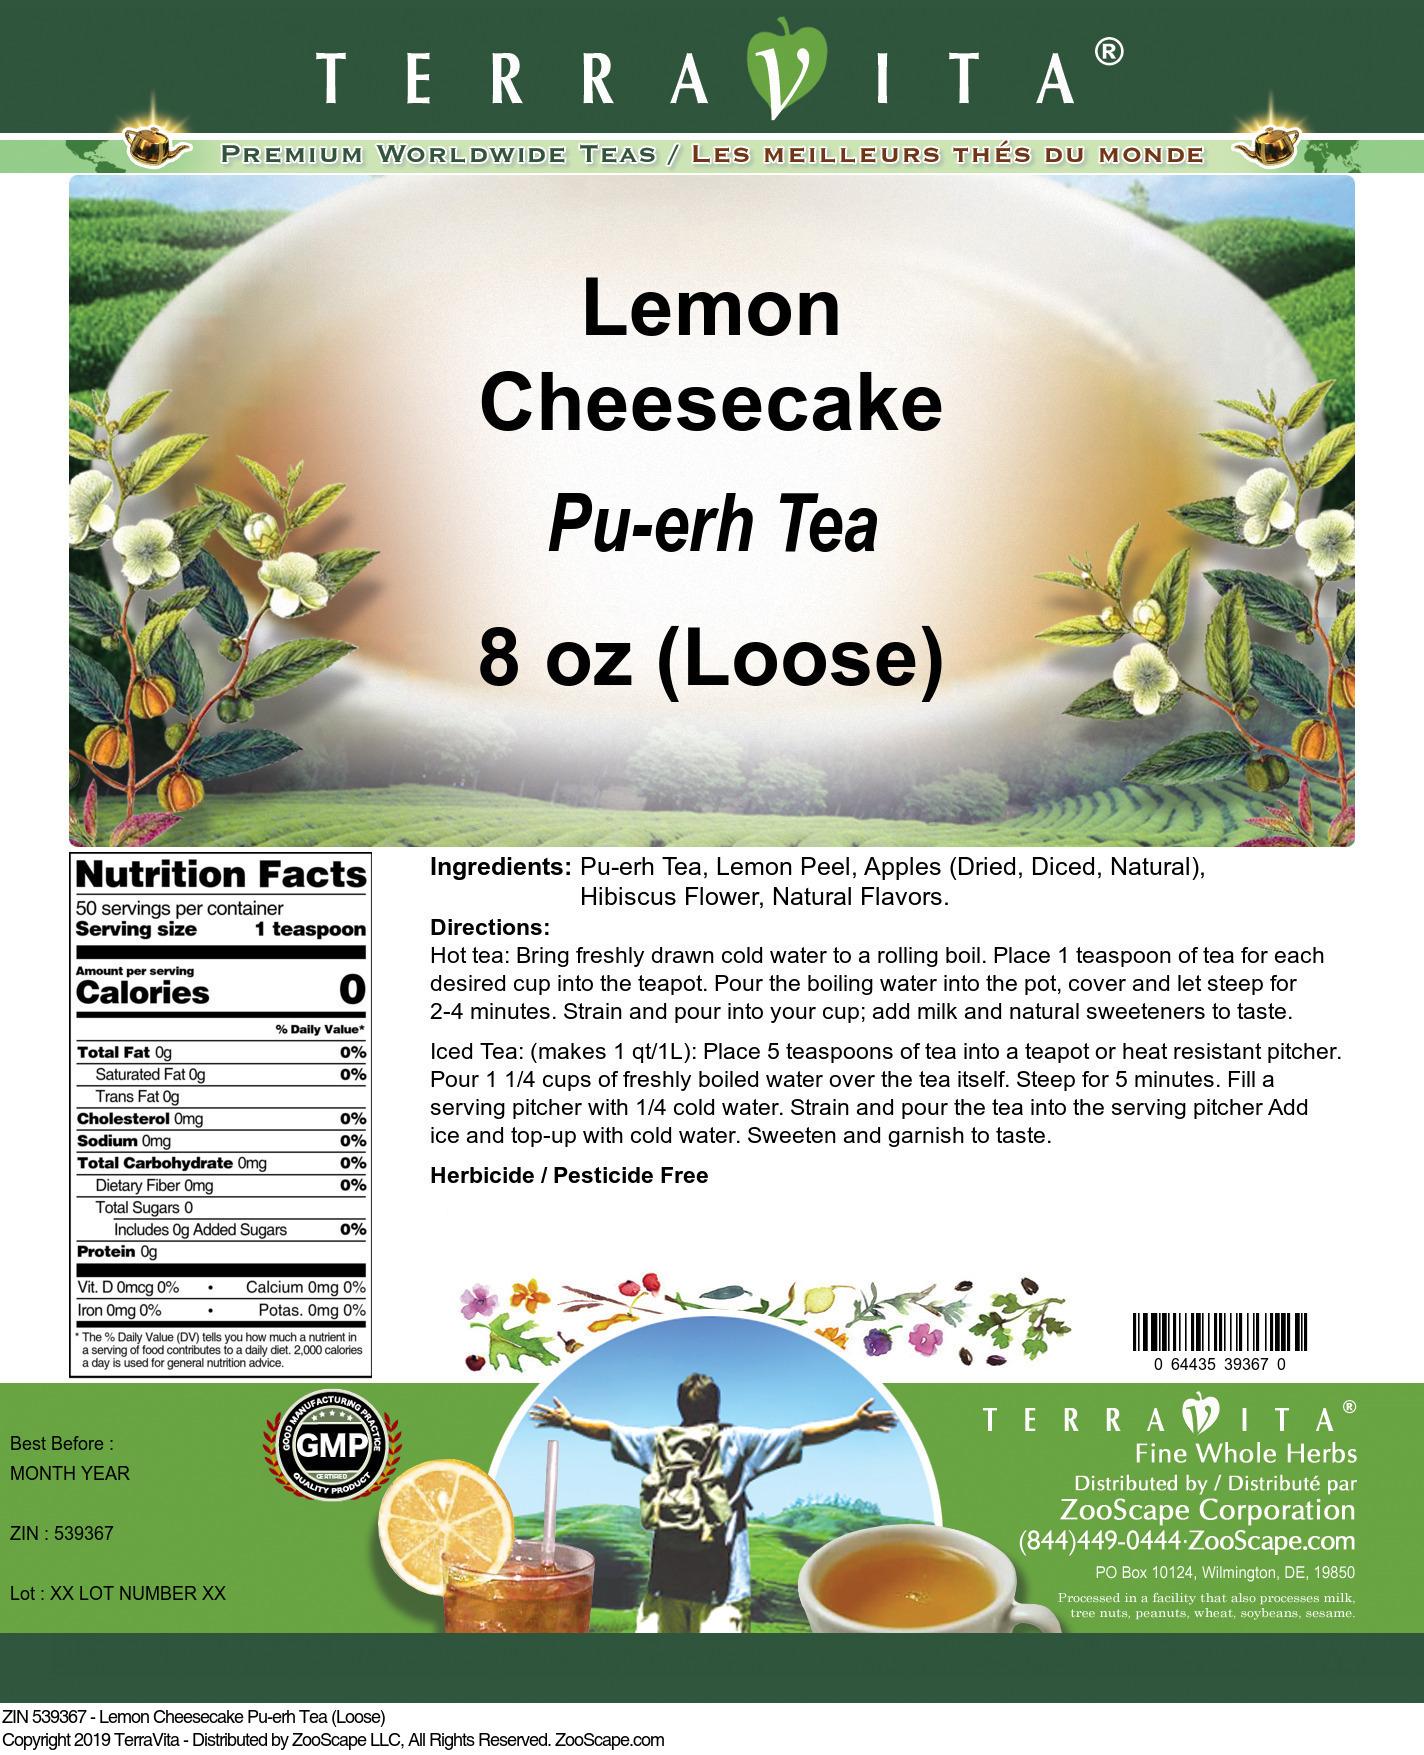 Lemon Cheesecake Pu-erh Tea